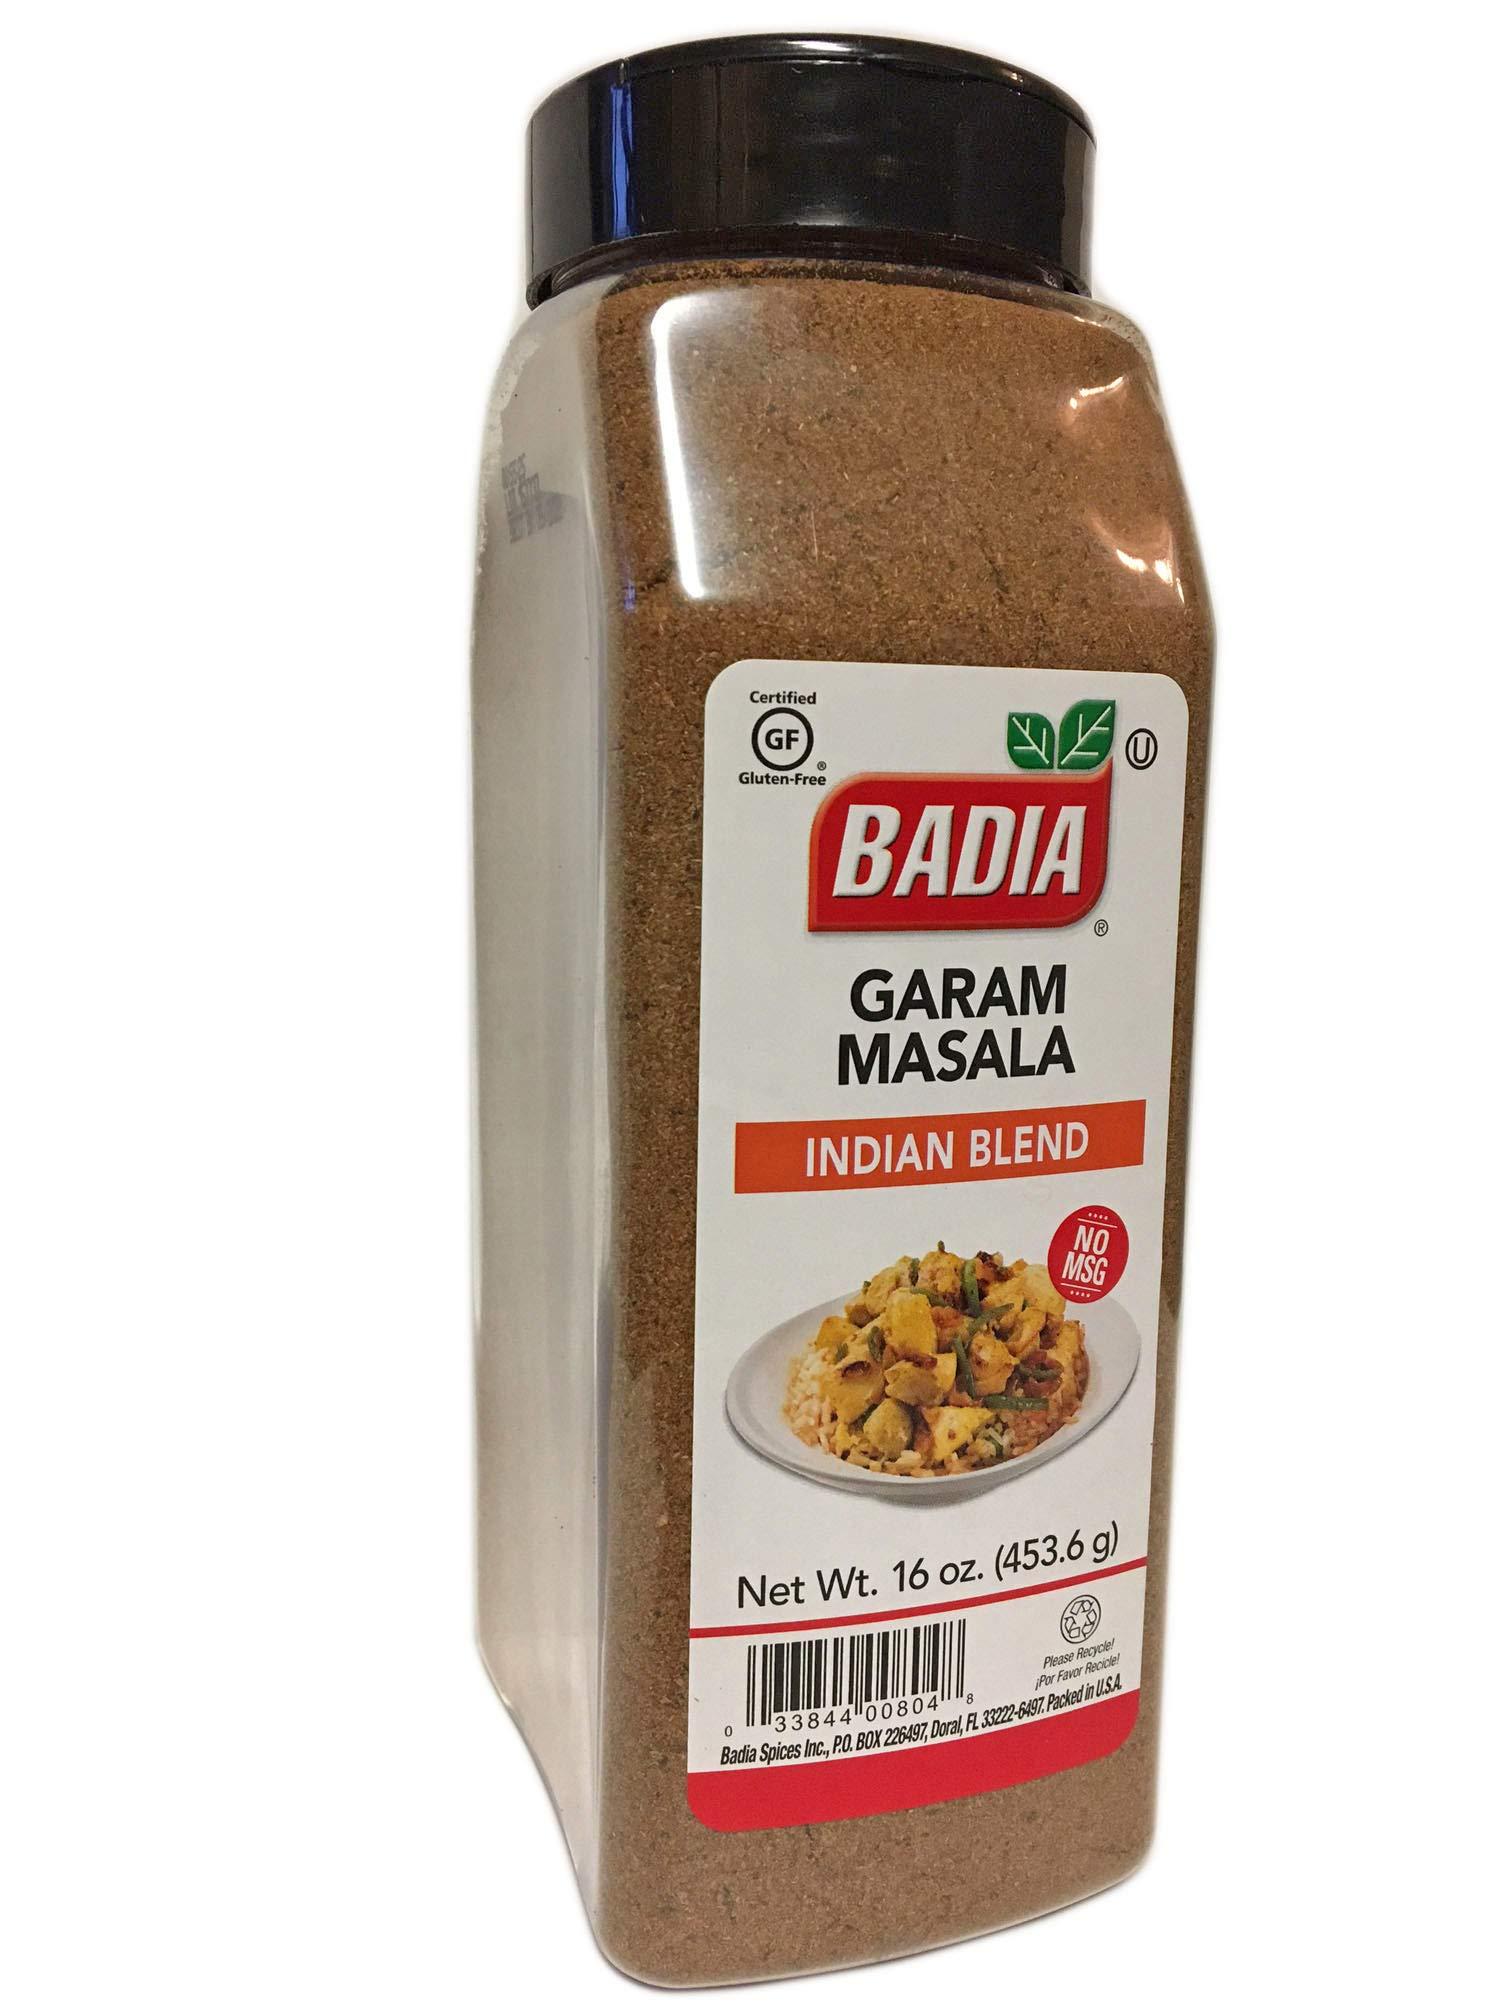 2 PACK-Garam Masala Indian Blend Seasoning No MSG Kosher 2x16 oz